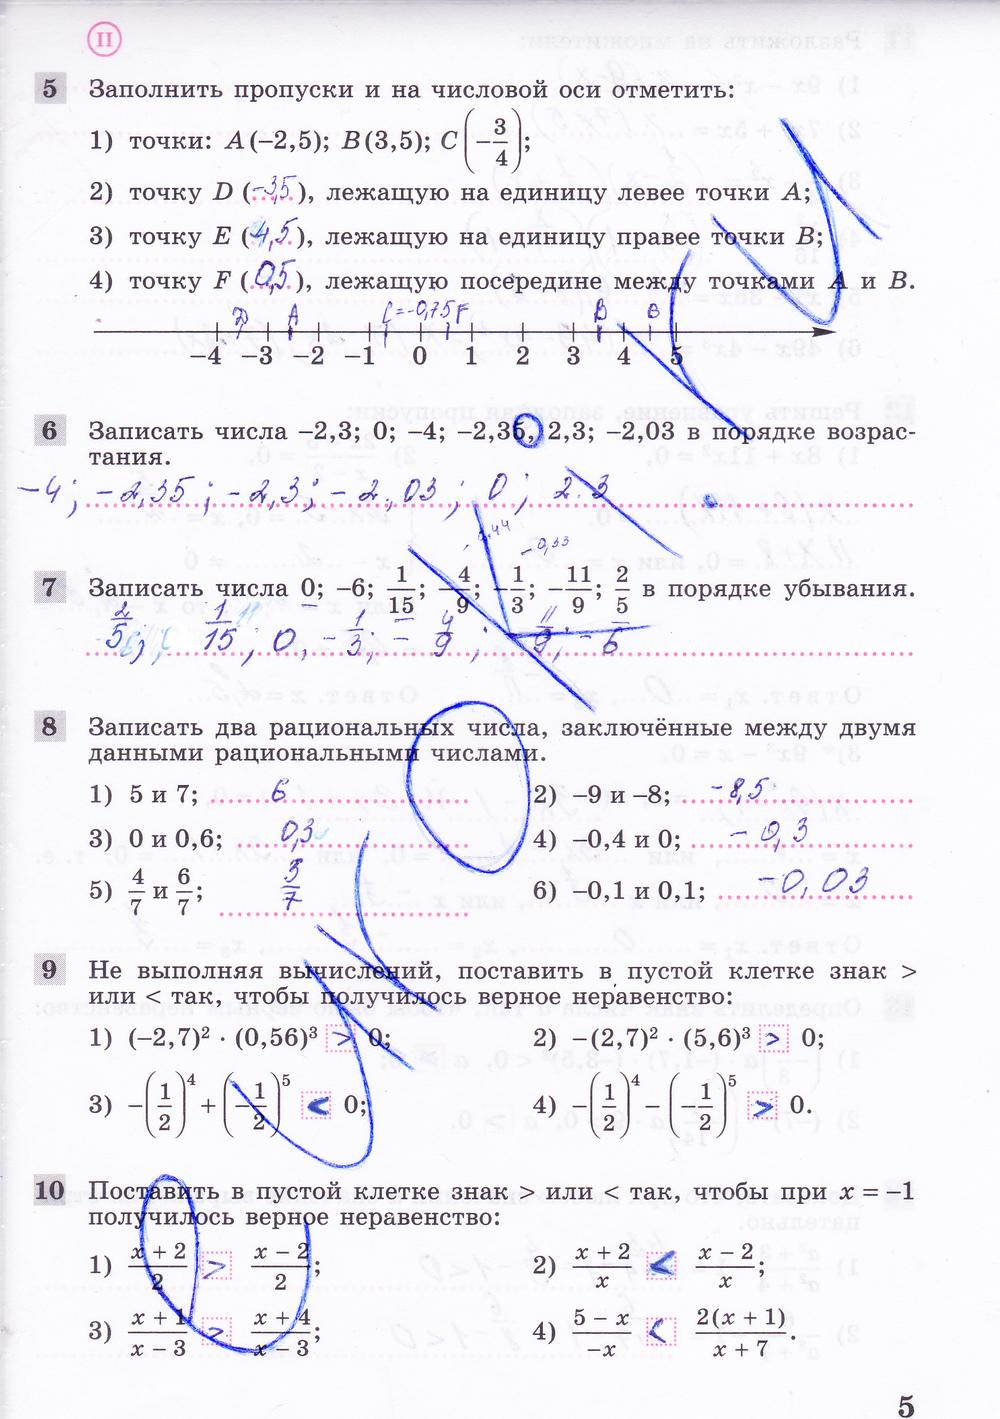 гдз по алгебре 8 класса рабочая тетрадь 2